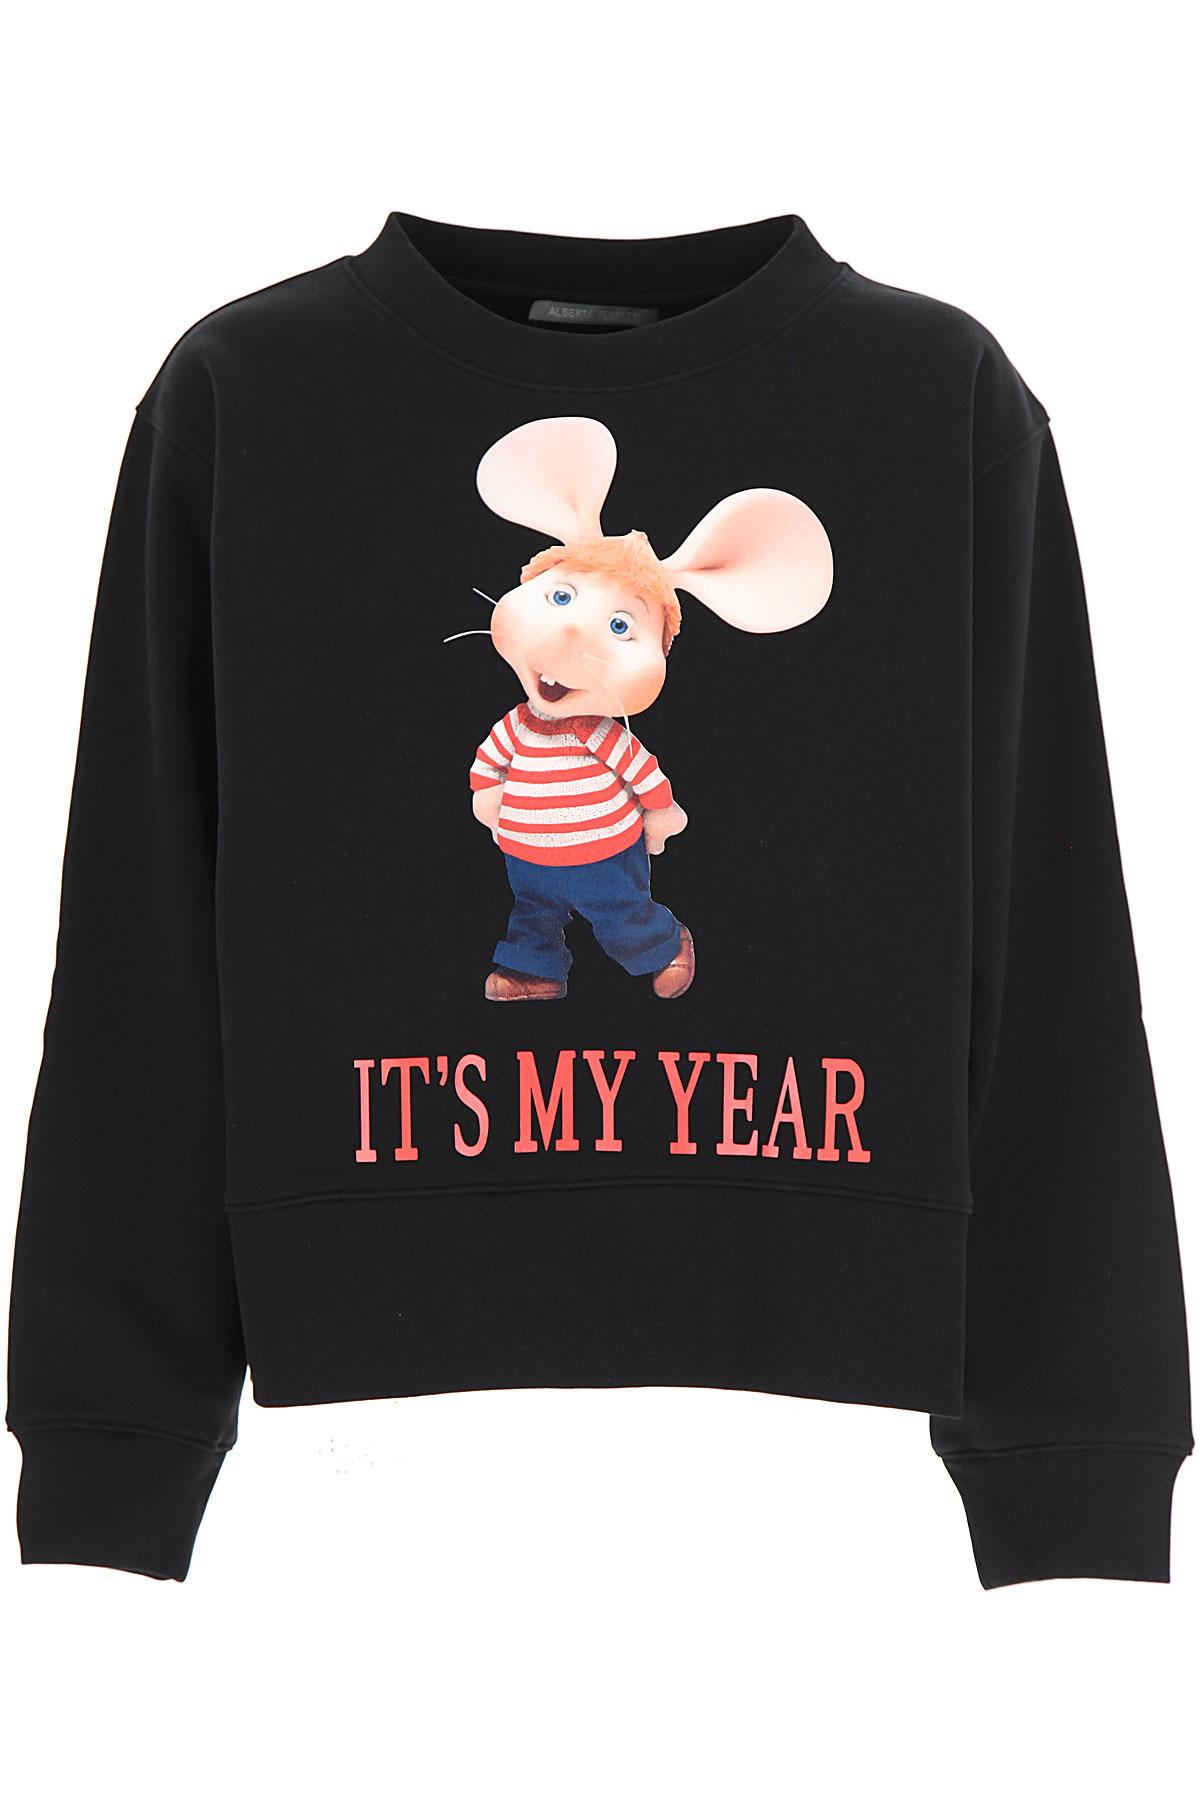 Alberta Ferretti Sweatshirt for Women On Sale, Black, Cotton, 2019, 2 4 6 8